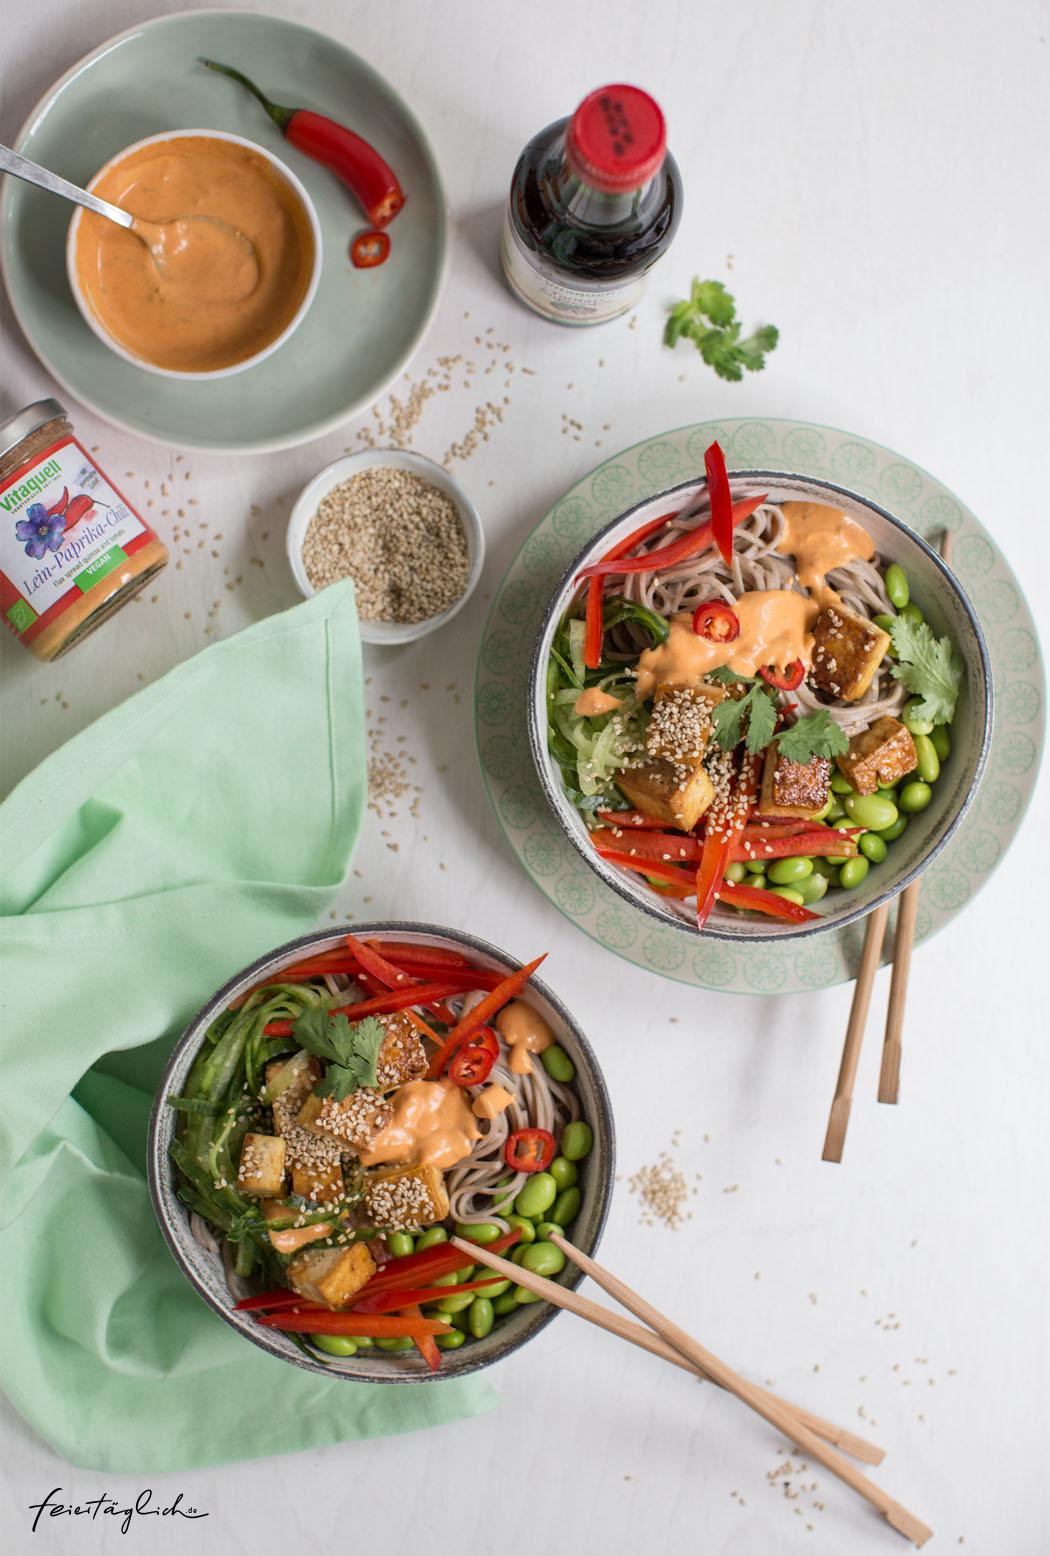 Rezept für vegane Sobanudel-Happy-Bowl mit Sesam-Tofu & Paprika-Chili Sauce, frischer Paprika, Gurke, Edamame & Koriander